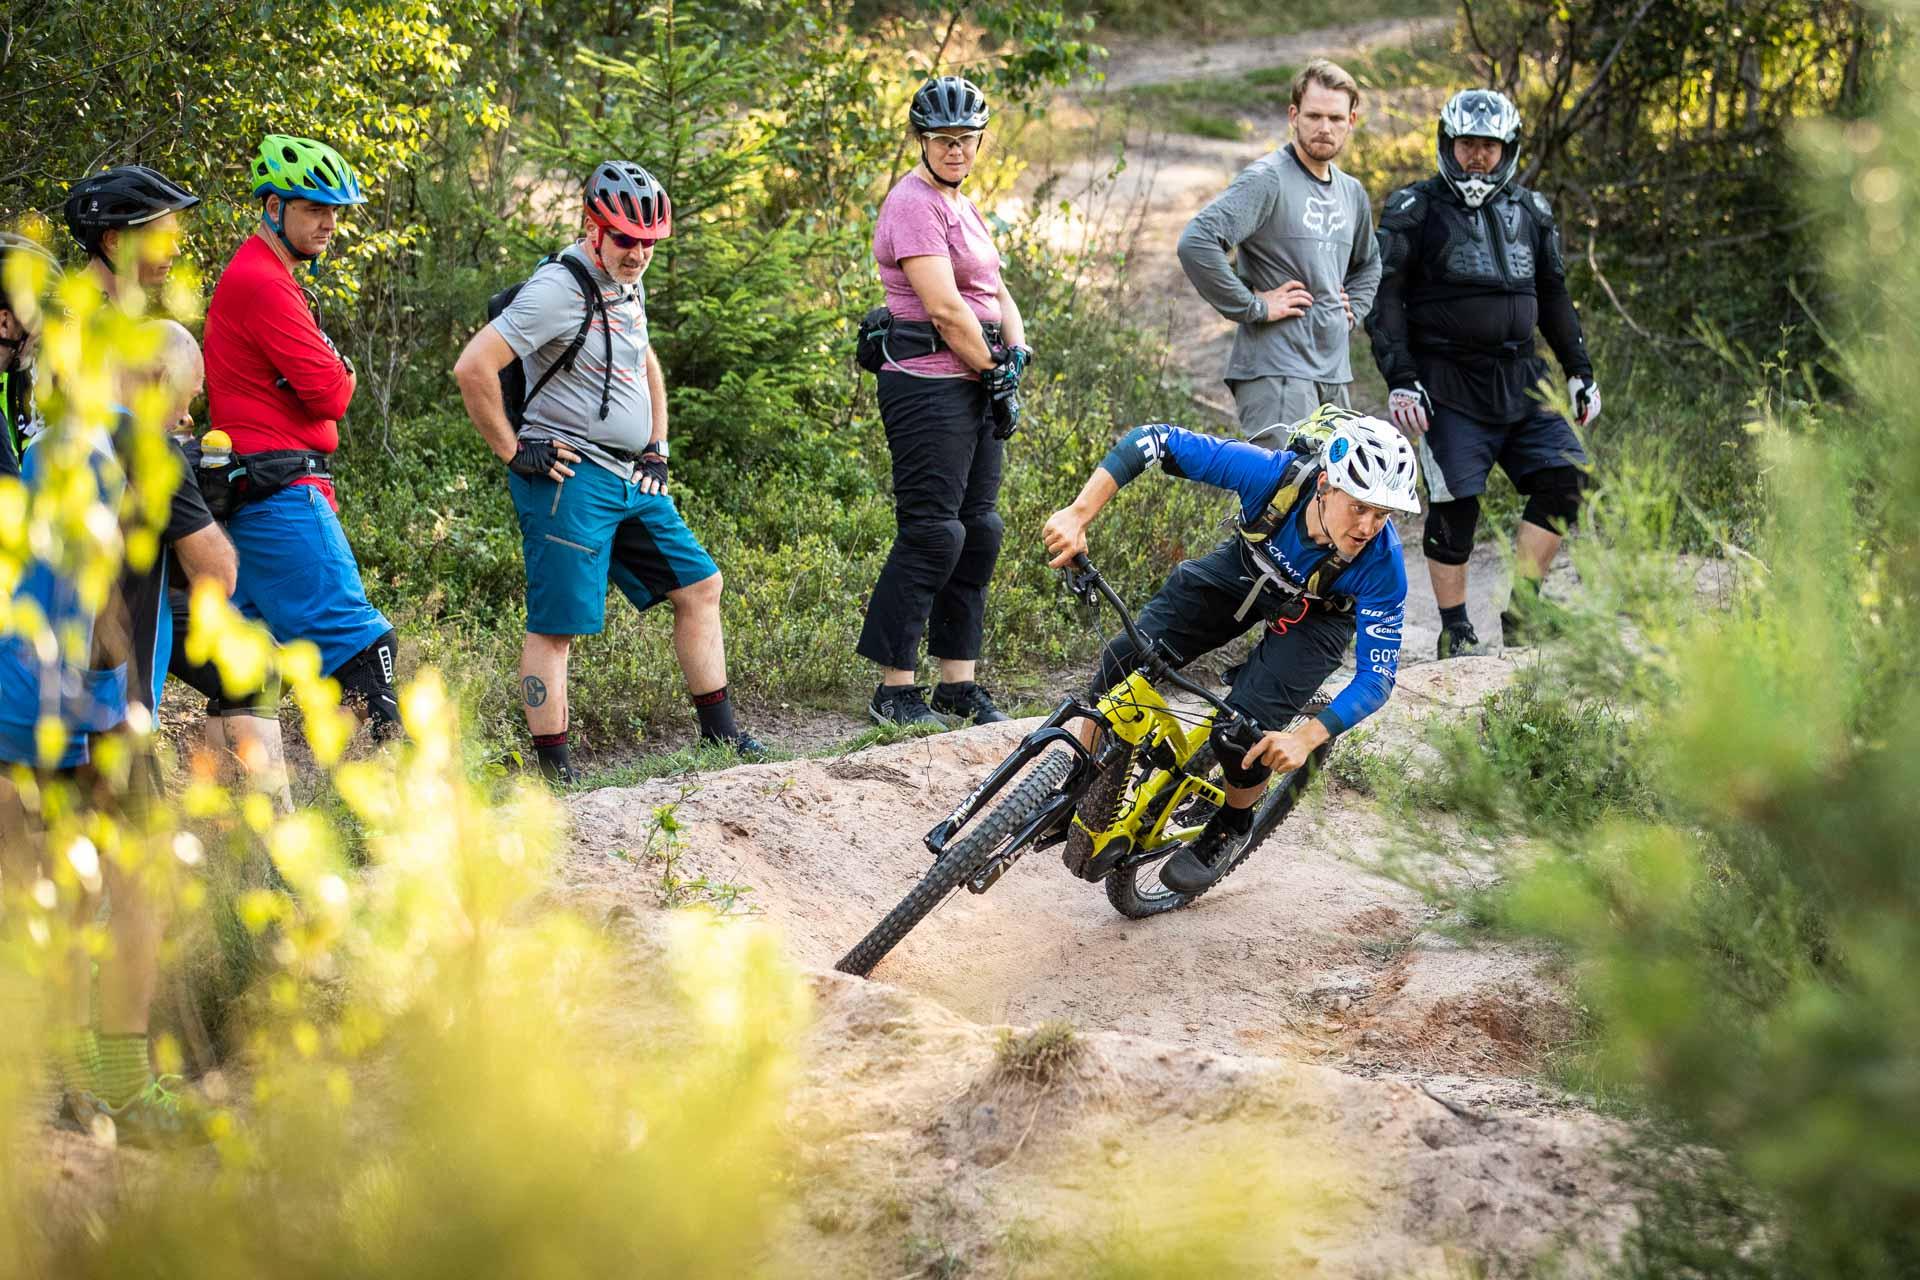 eMTB Fortgeschritten Fahrtechnik Kurs in Moers - Niederrhein Duisburg Ruhrgebiet - eBike- Rock my Trail Bikeschule GmbH